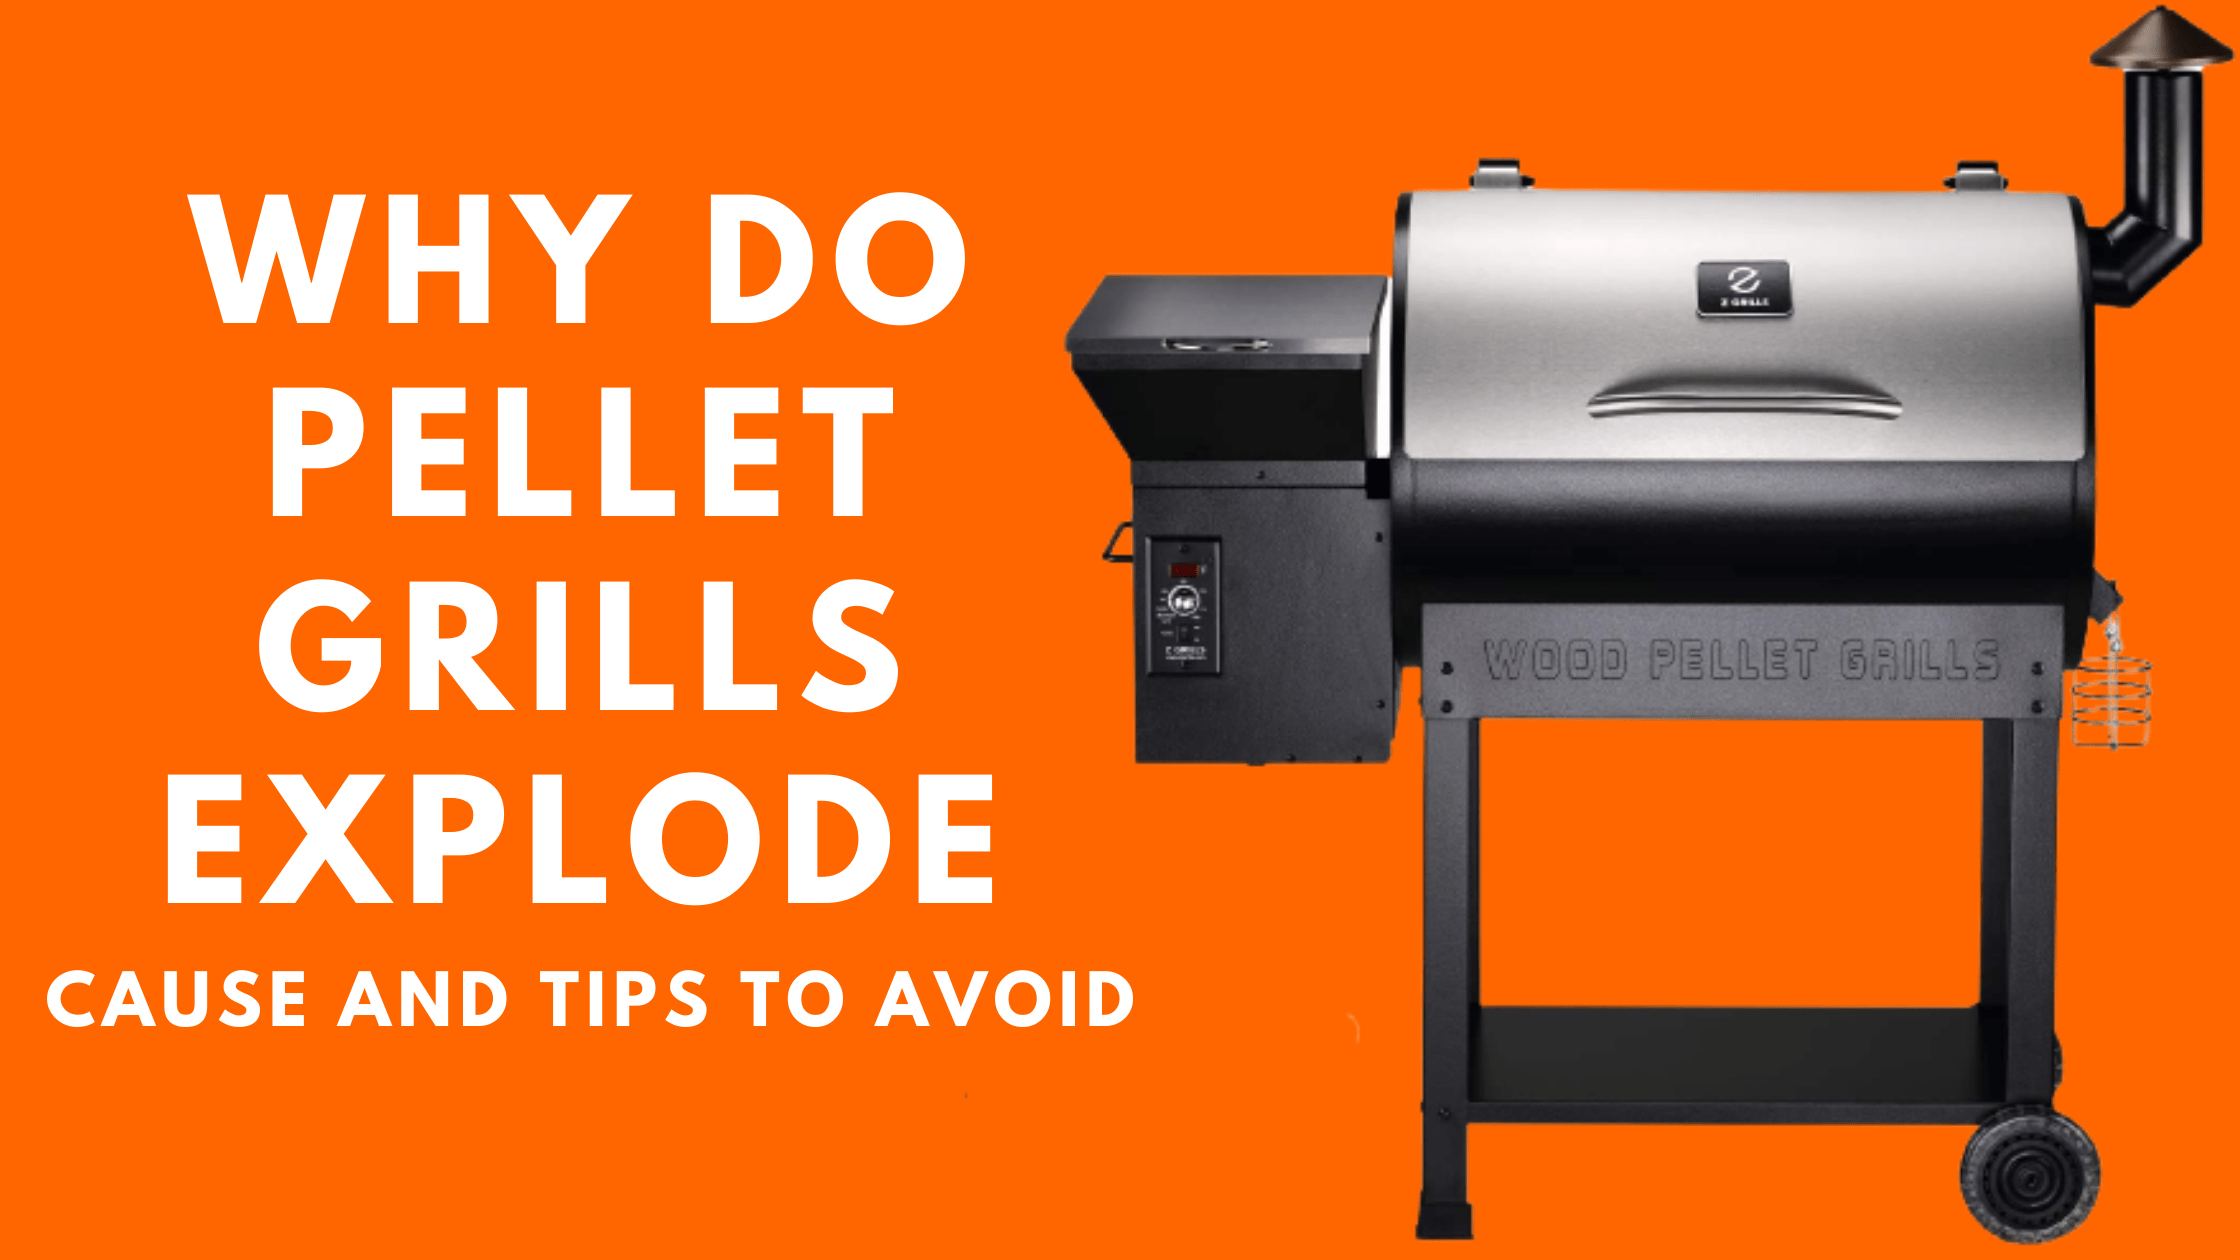 Why do pellet grills explode